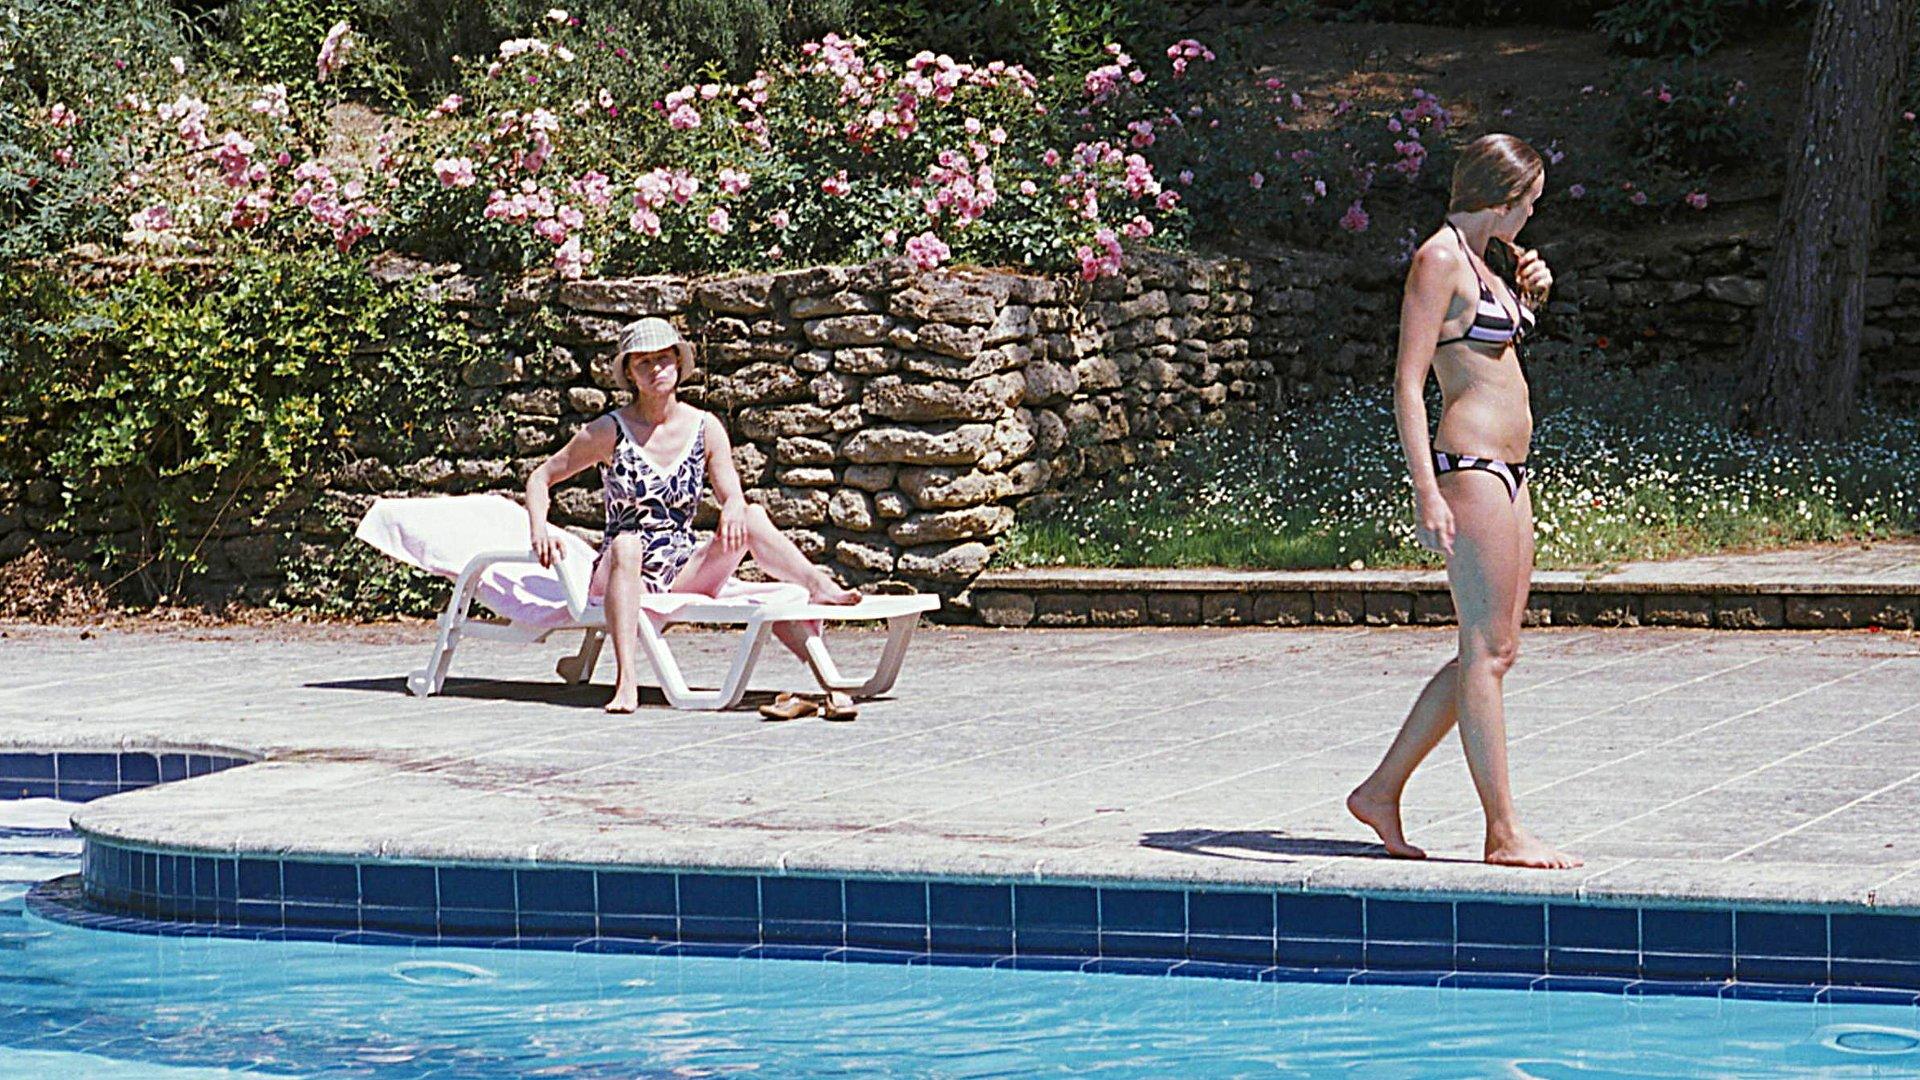 Swimming pool 2003 film cin s ries - Ludivine sagnier the swimming pool ...